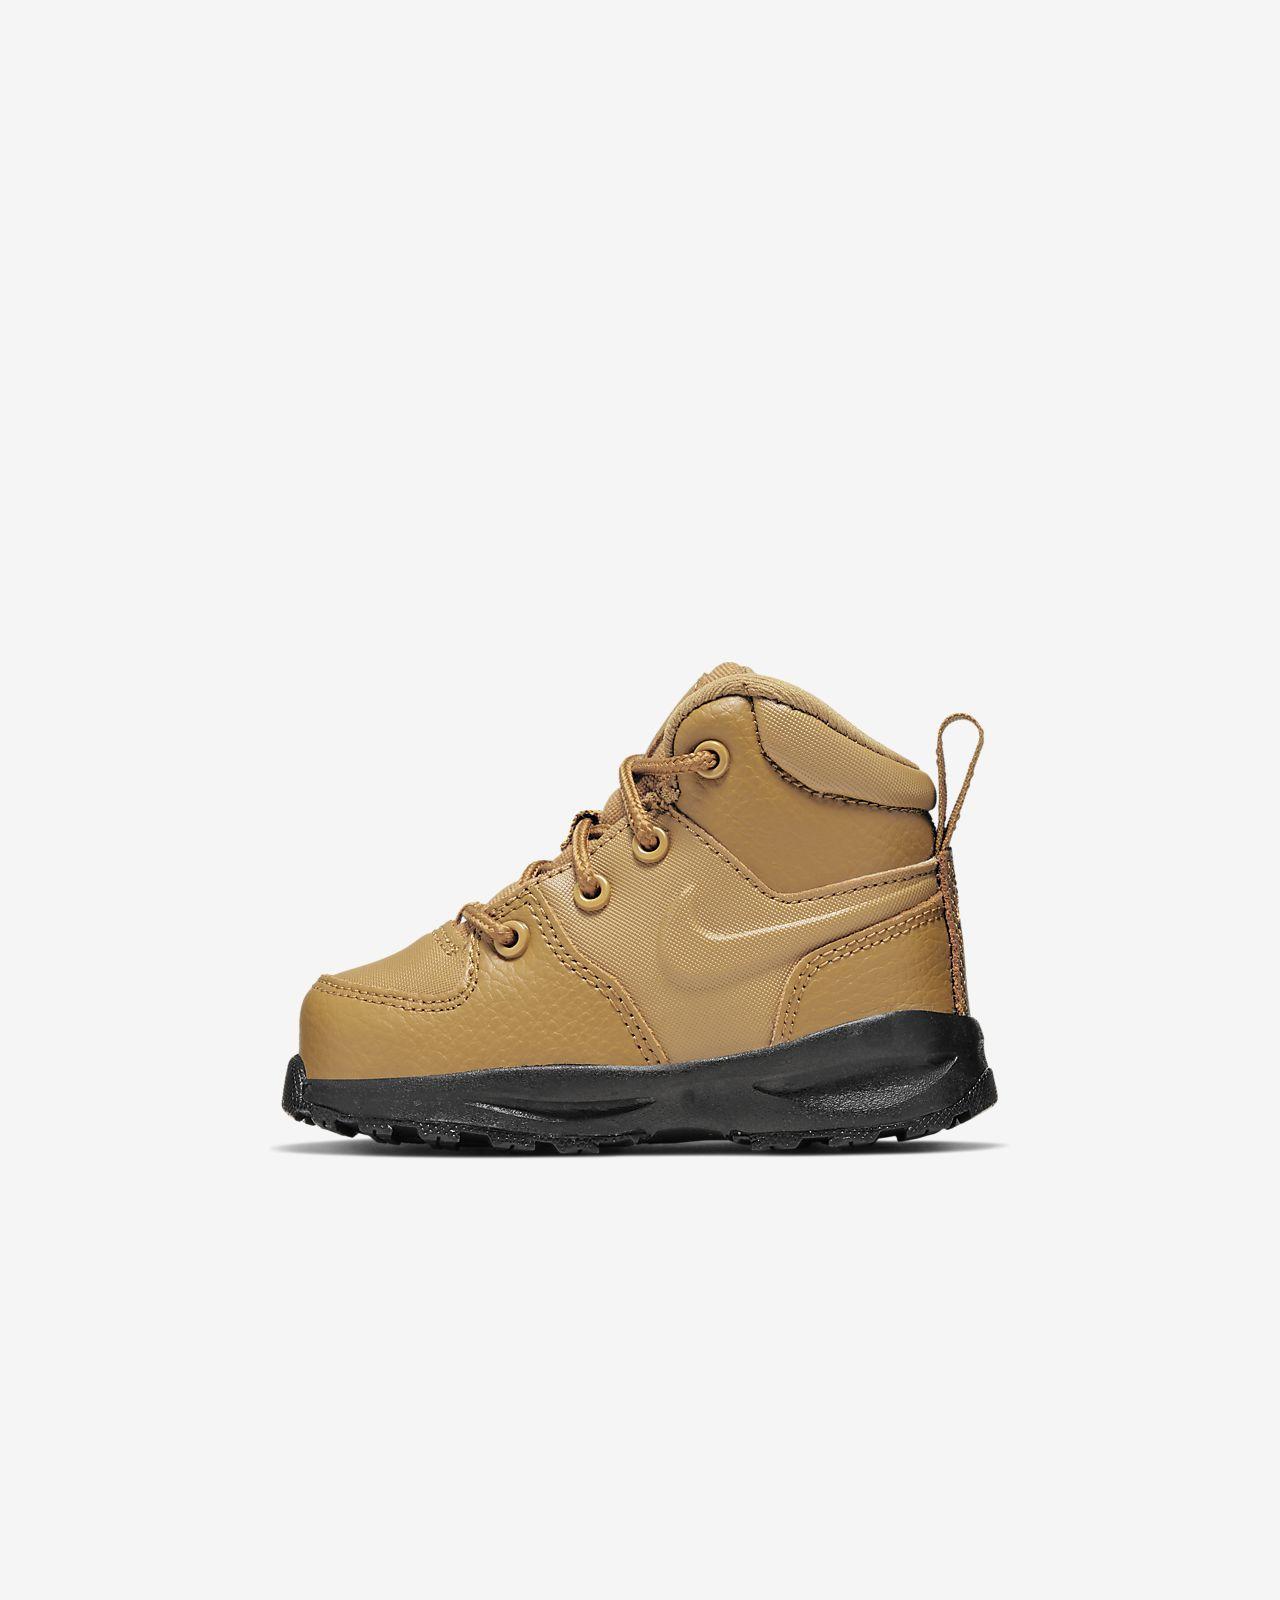 Nike Manoa BabyToddler Boot